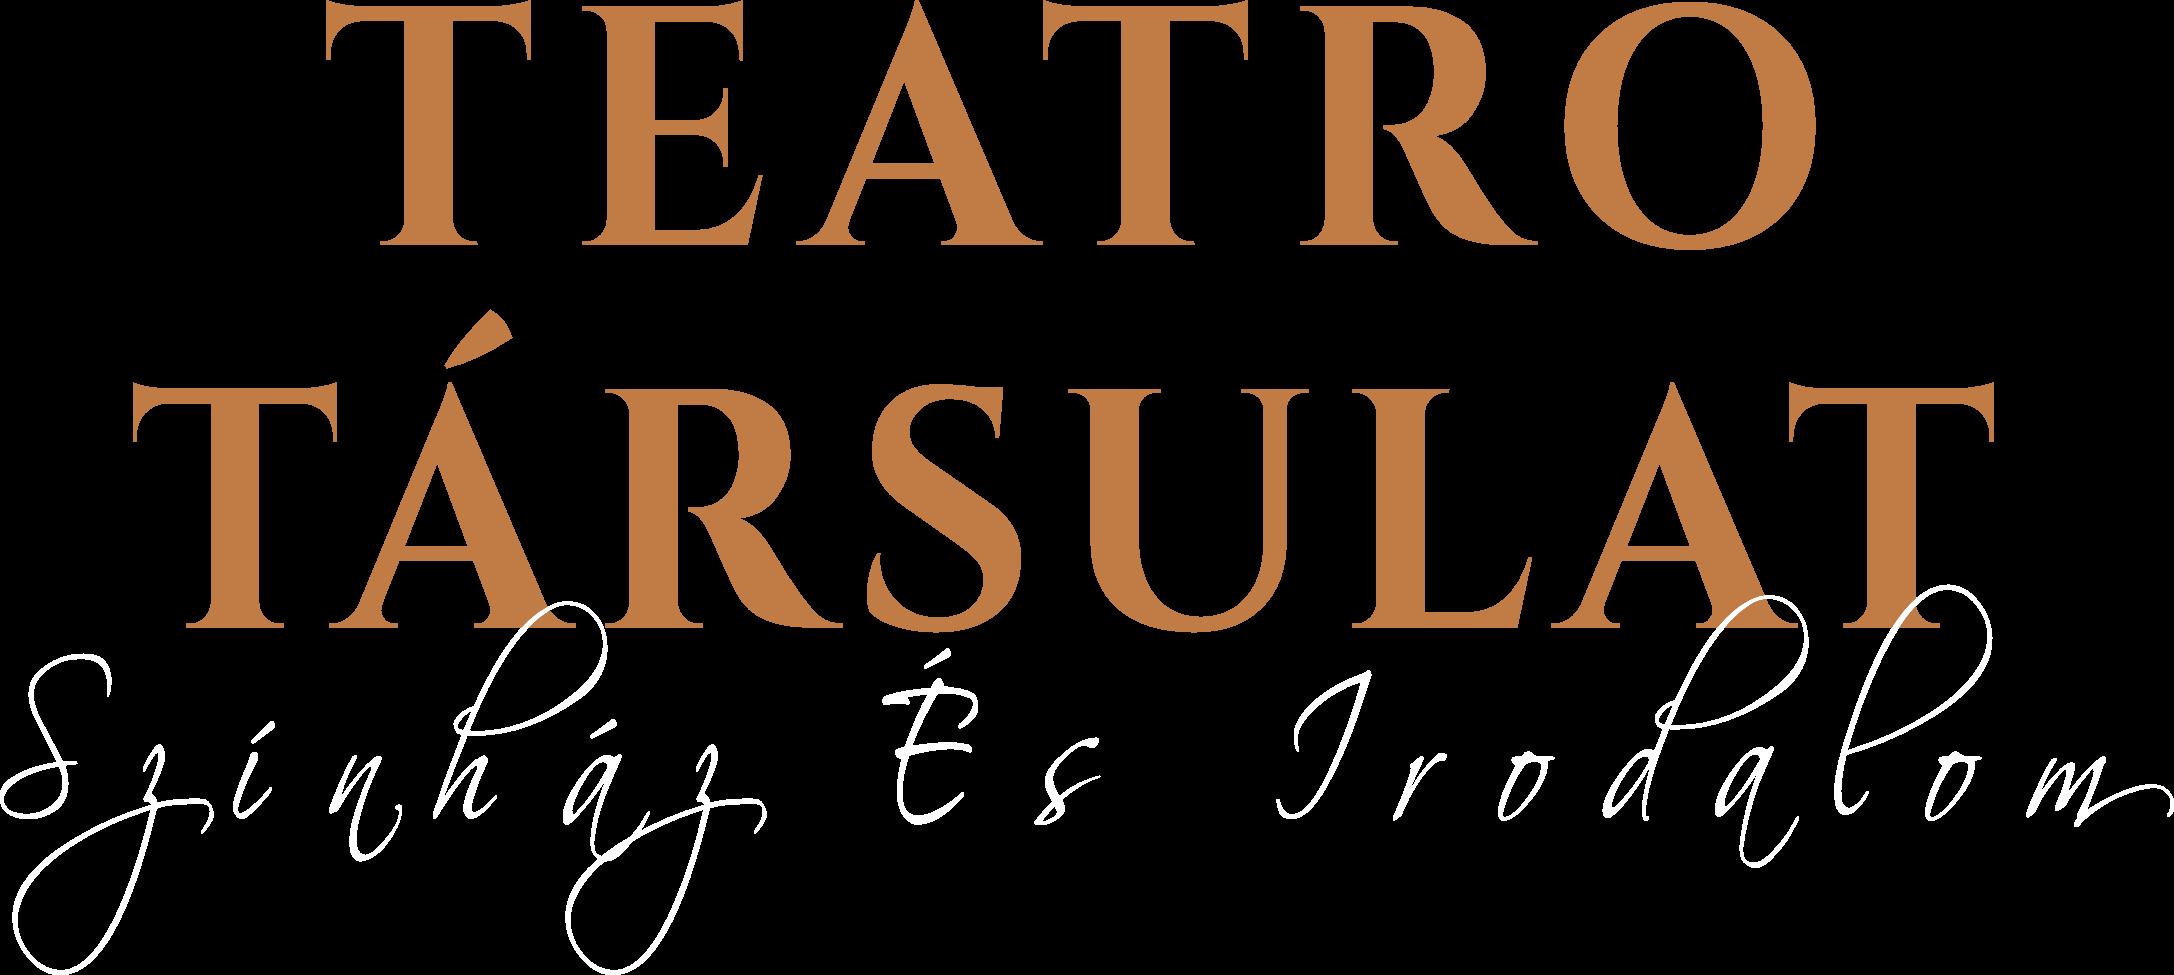 Teatro Társulat